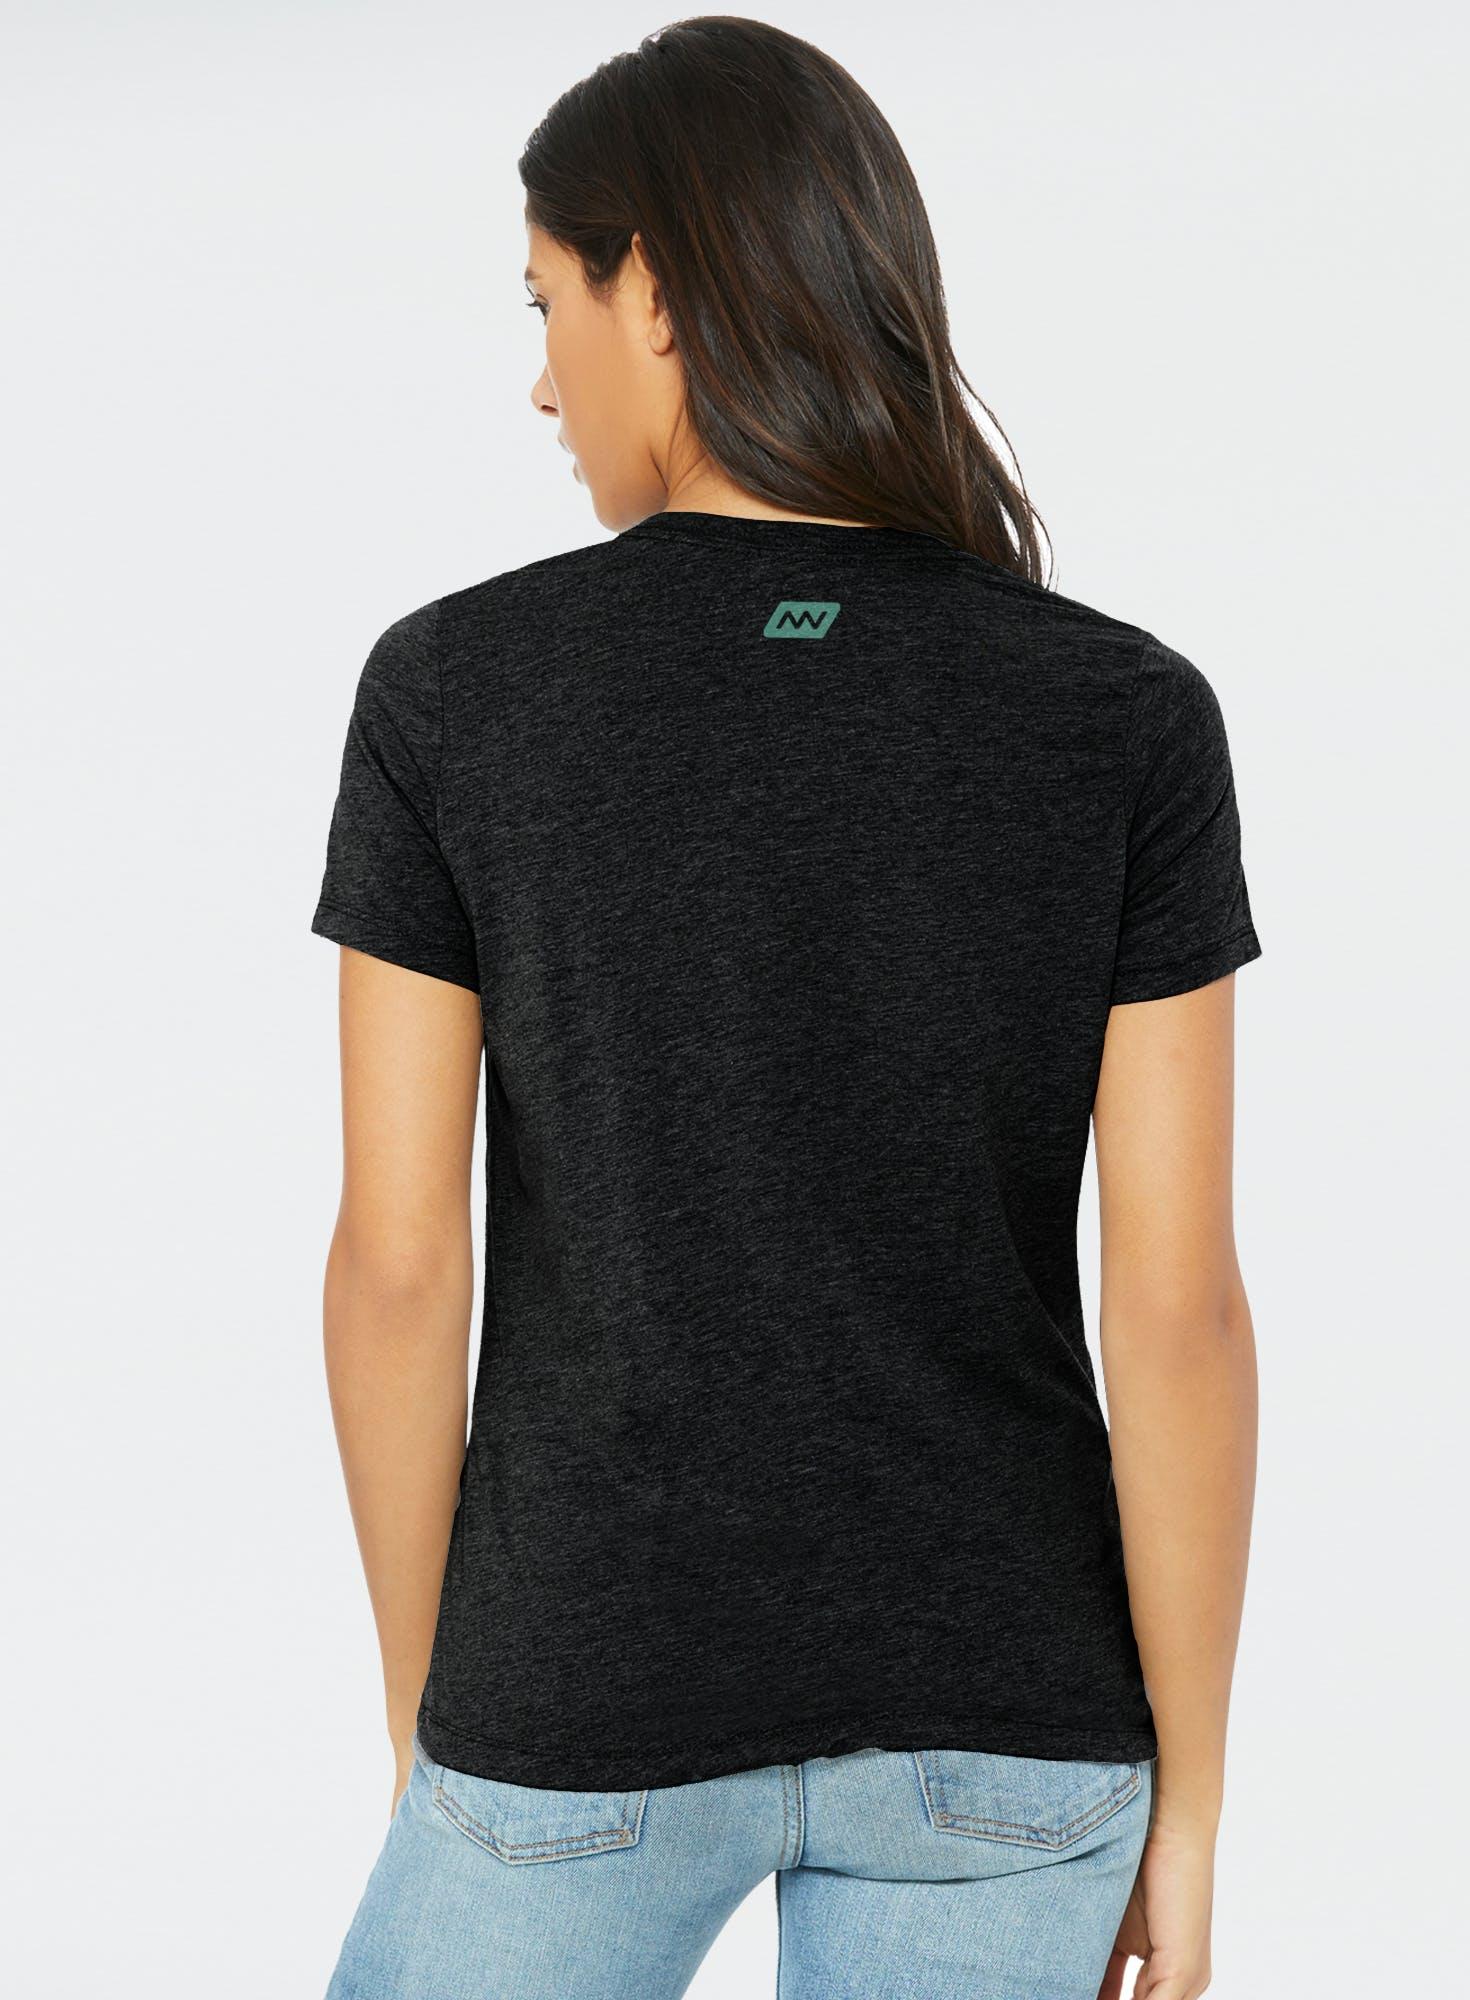 Women's Onnit Tri-Blend T-Shirt Bonus Image